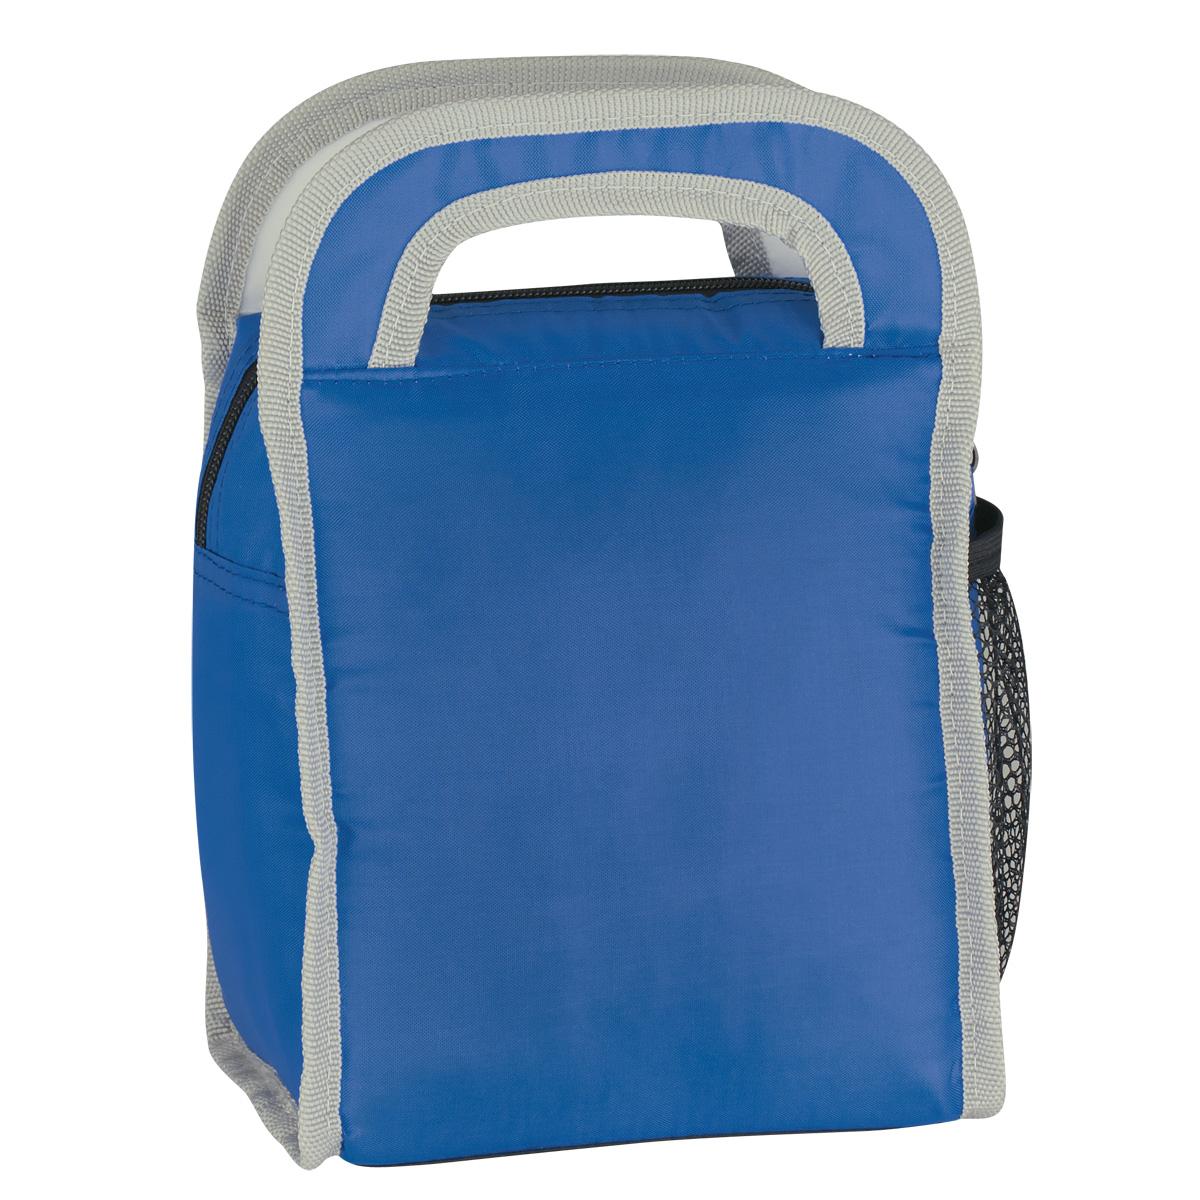 3520 polar lunch bag